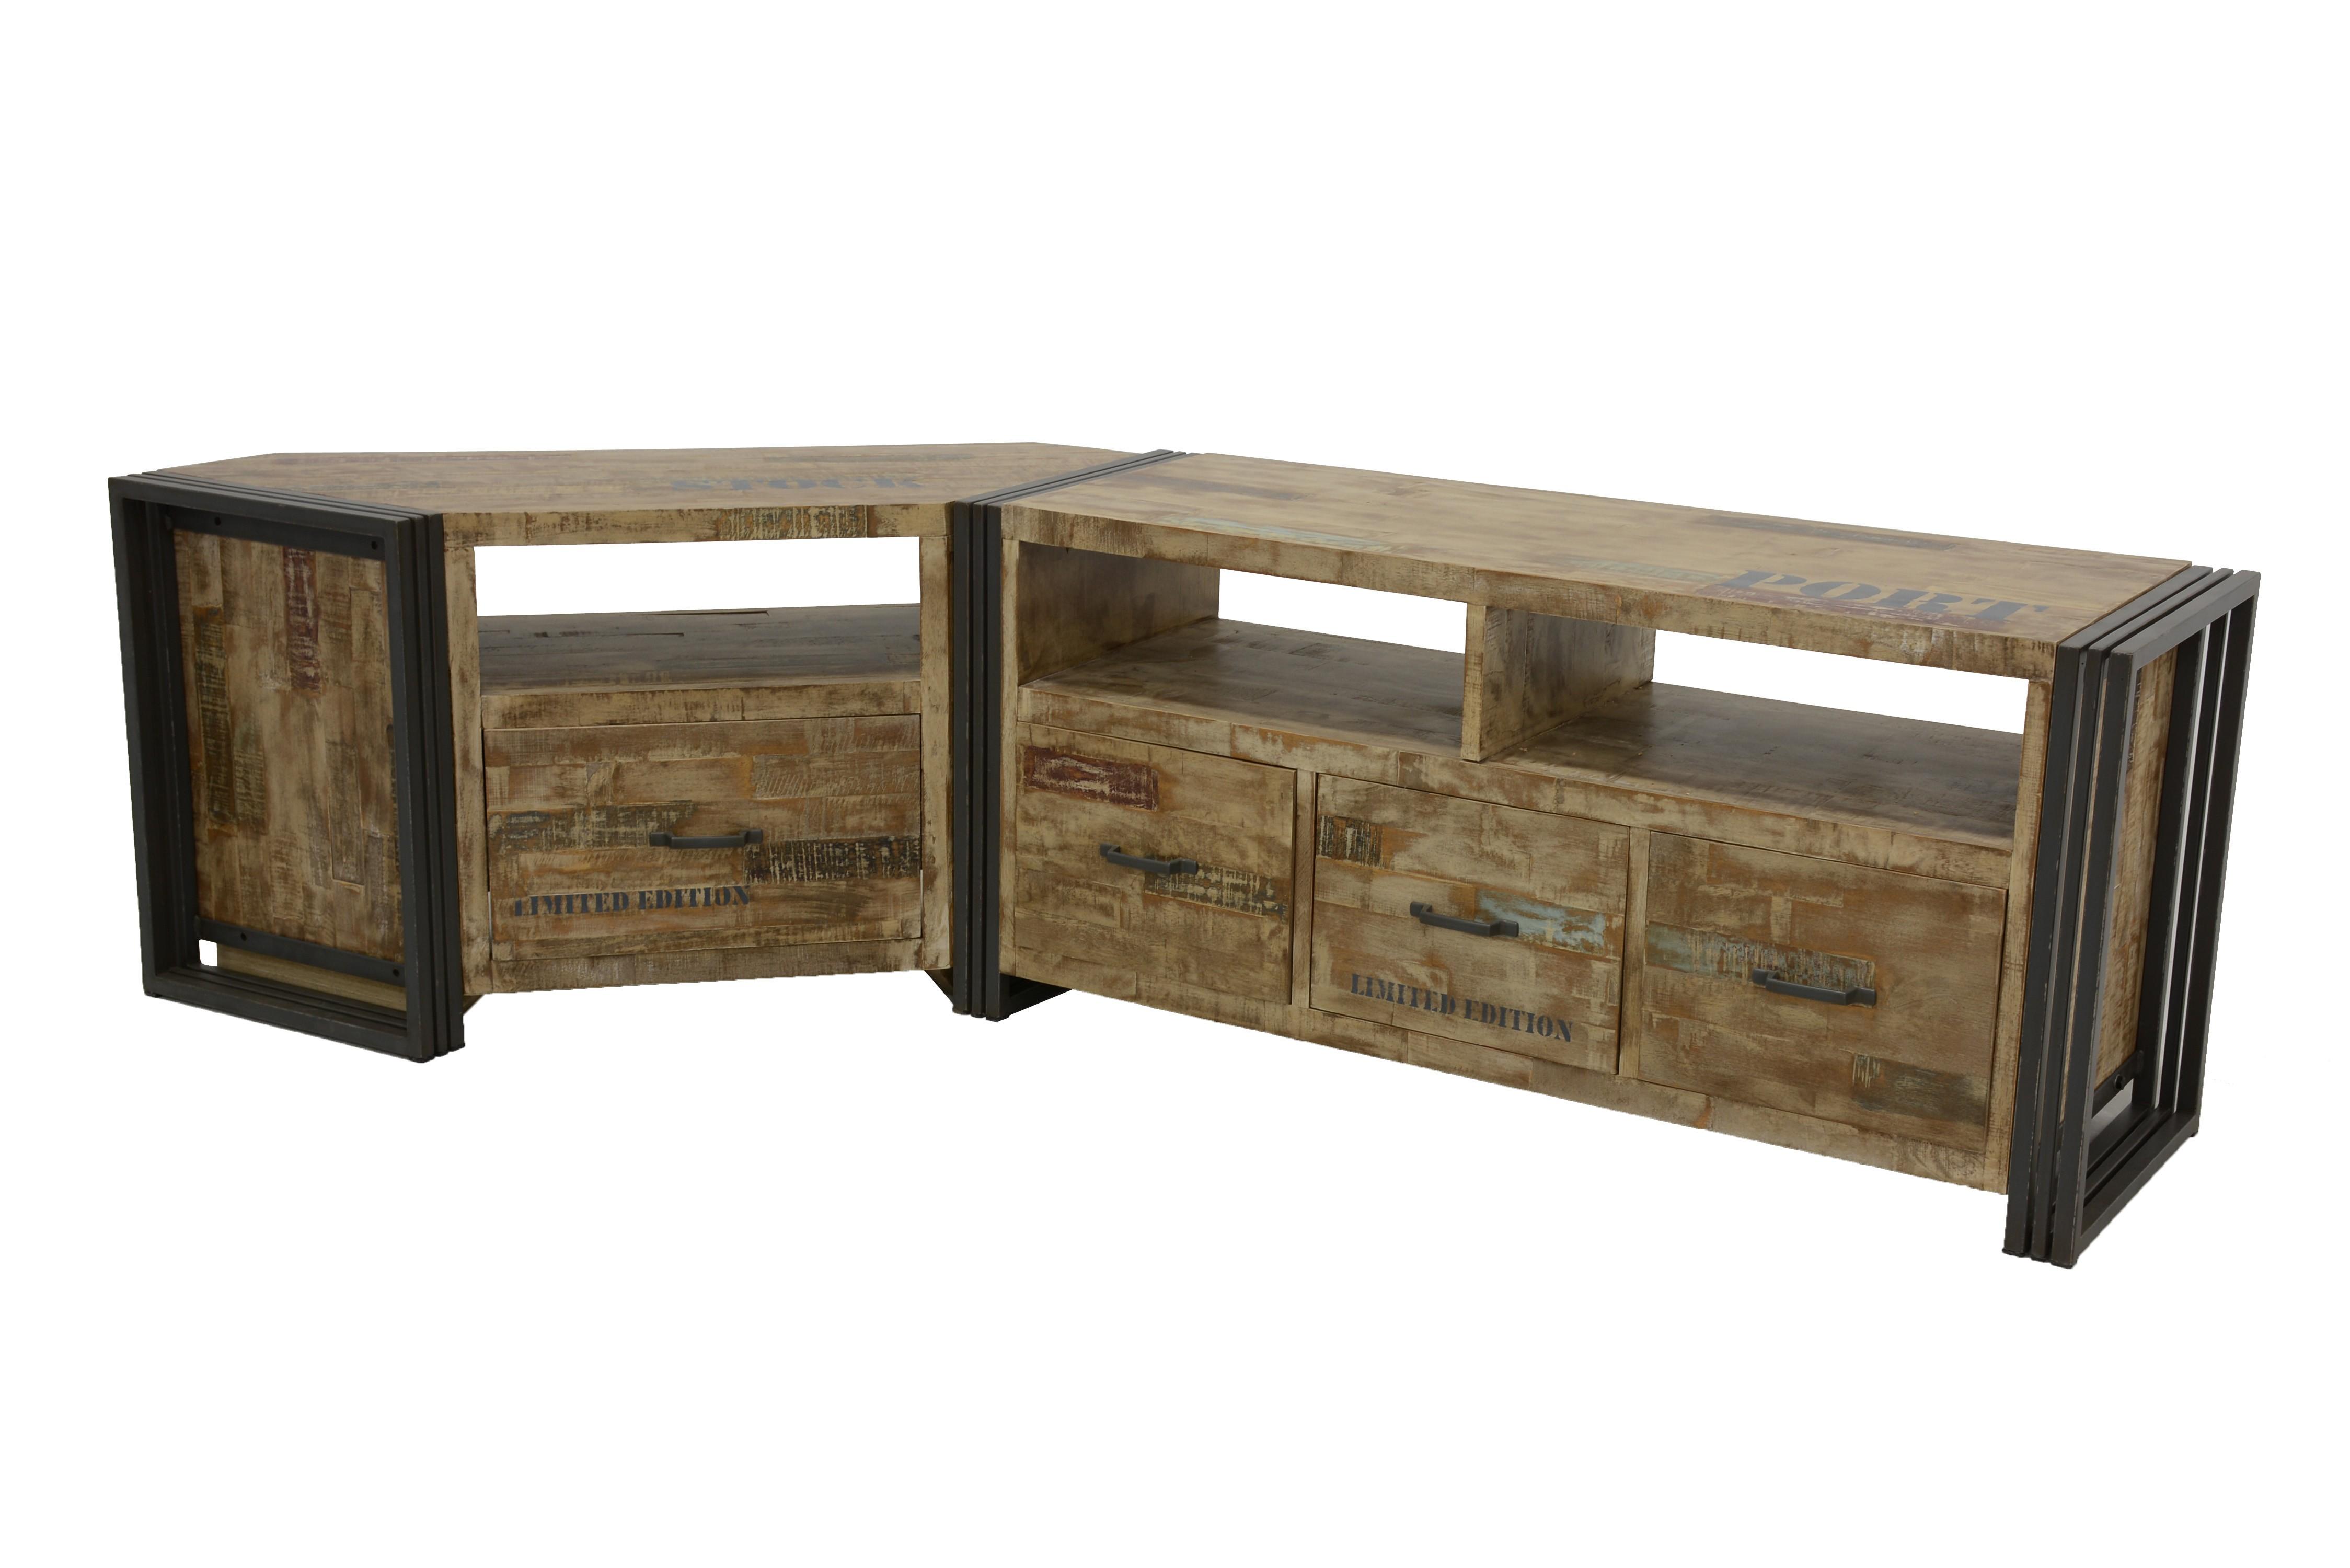 Meuble Tv Angle Suspendu meuble tv d'angle hévéa recyclé blanchi et métal noirci 1 tiroir 1 niche  115x40x55cm docker